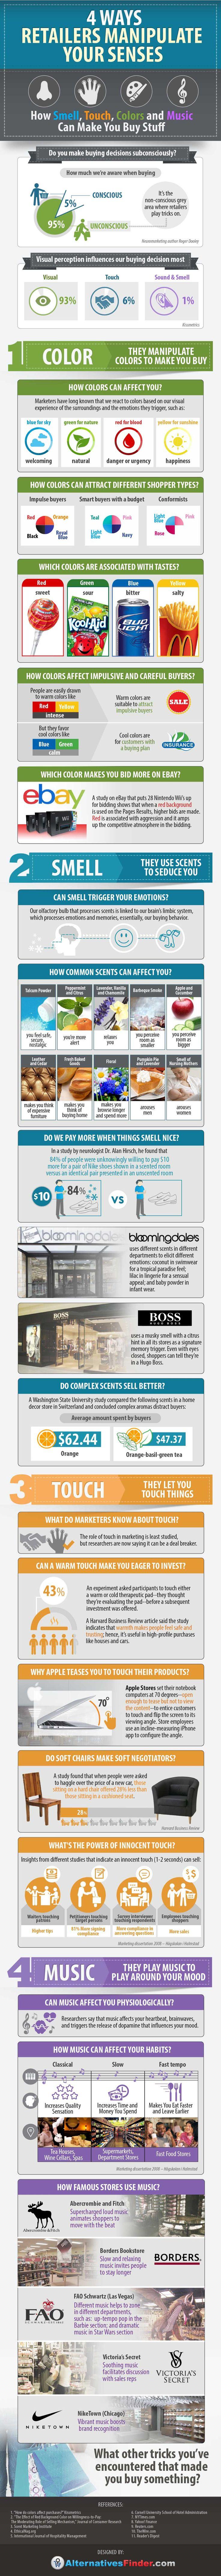 4 ways retailers manipulate you senses. #mktnutricional #sentidos #marketing